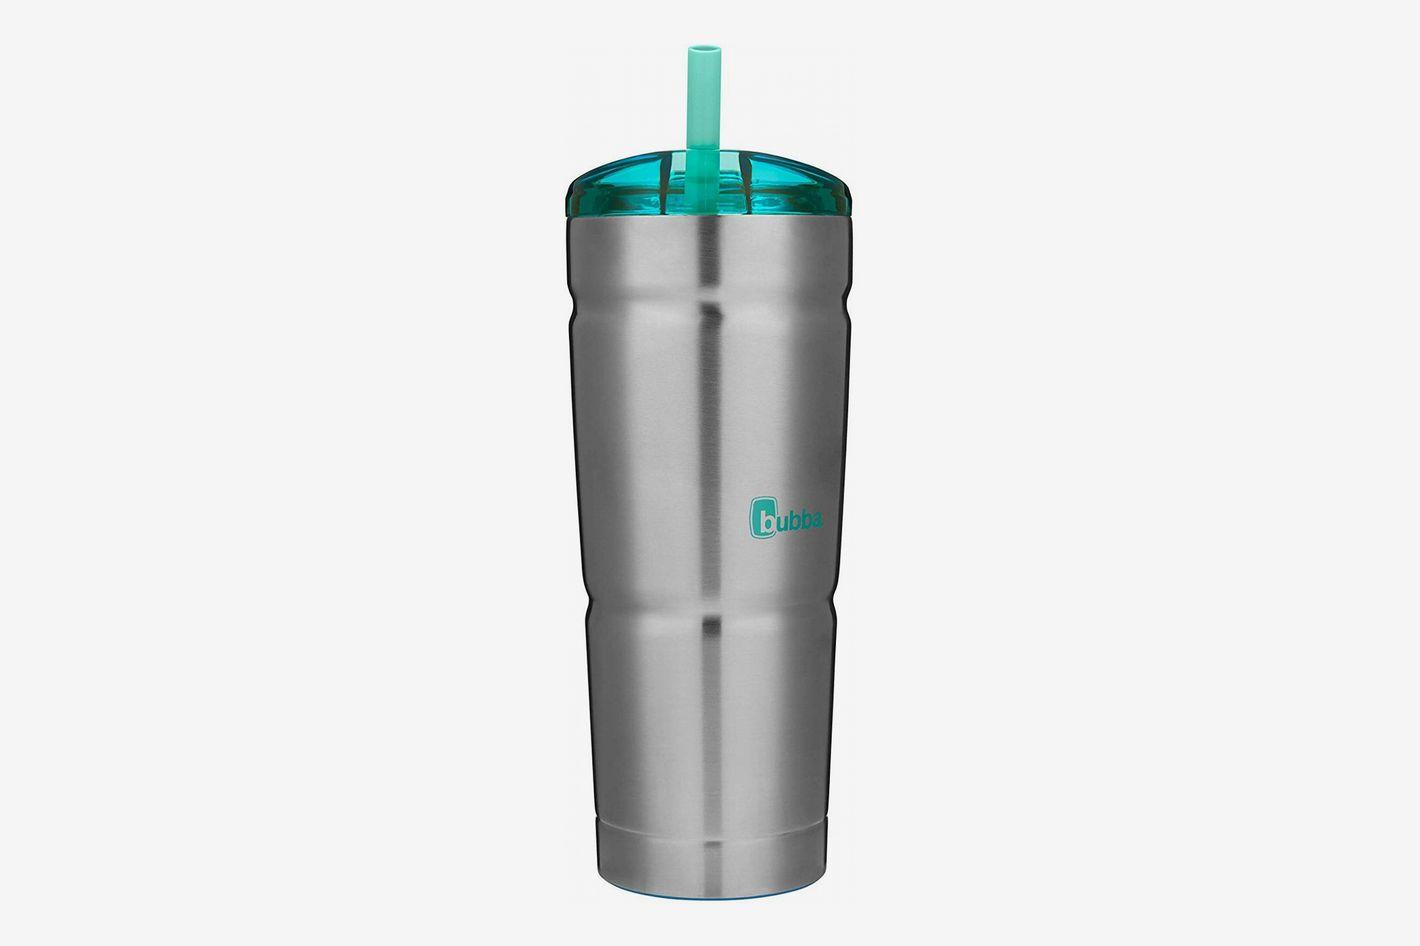 da7c941eb6 26 Best Water Bottles 2019: Stainless Steel, Reusable & More